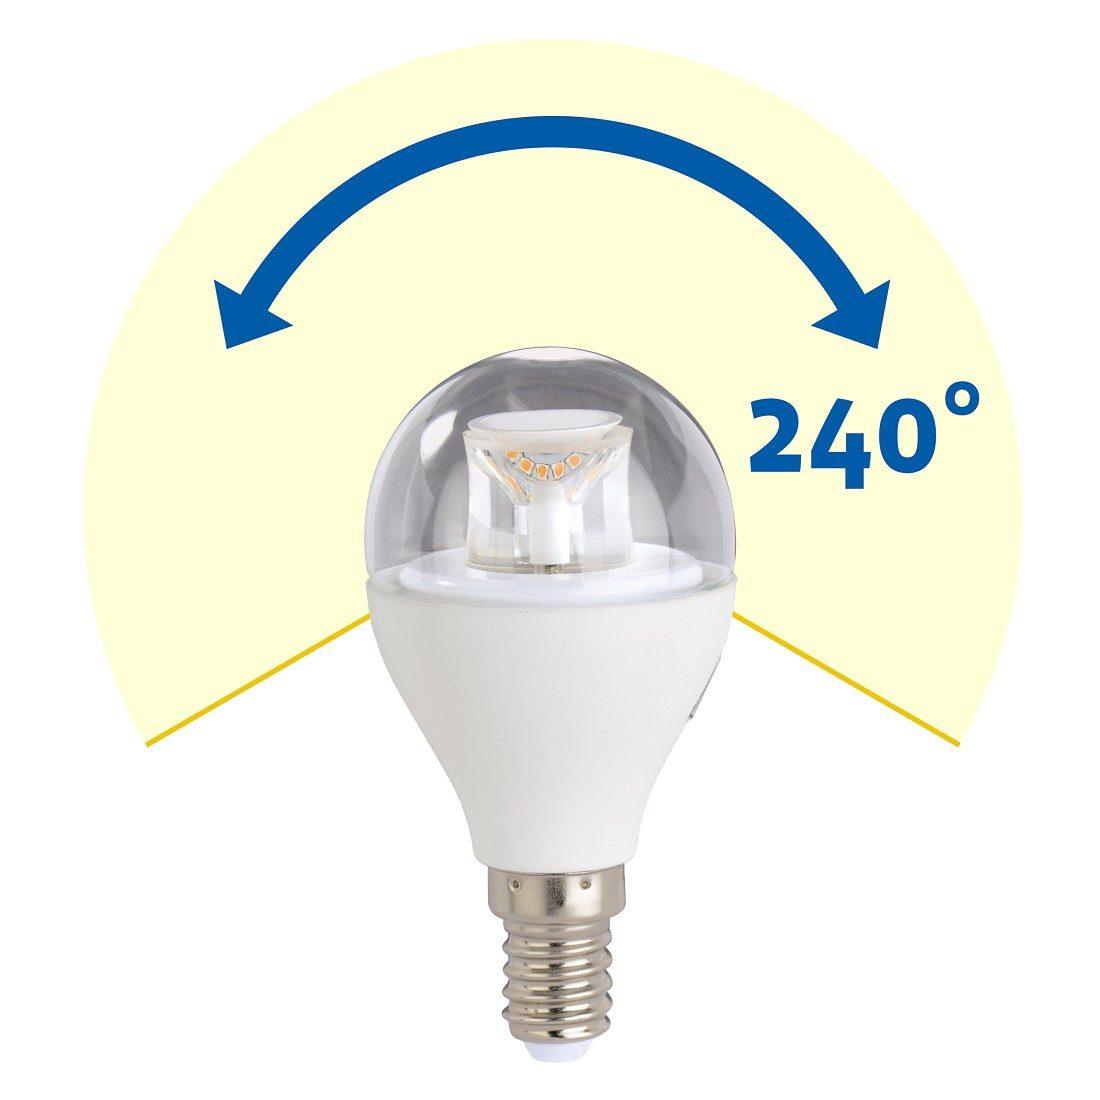 Xavax LED-Lampe, 5,9W, Tropfenform, E14, Warmweiß